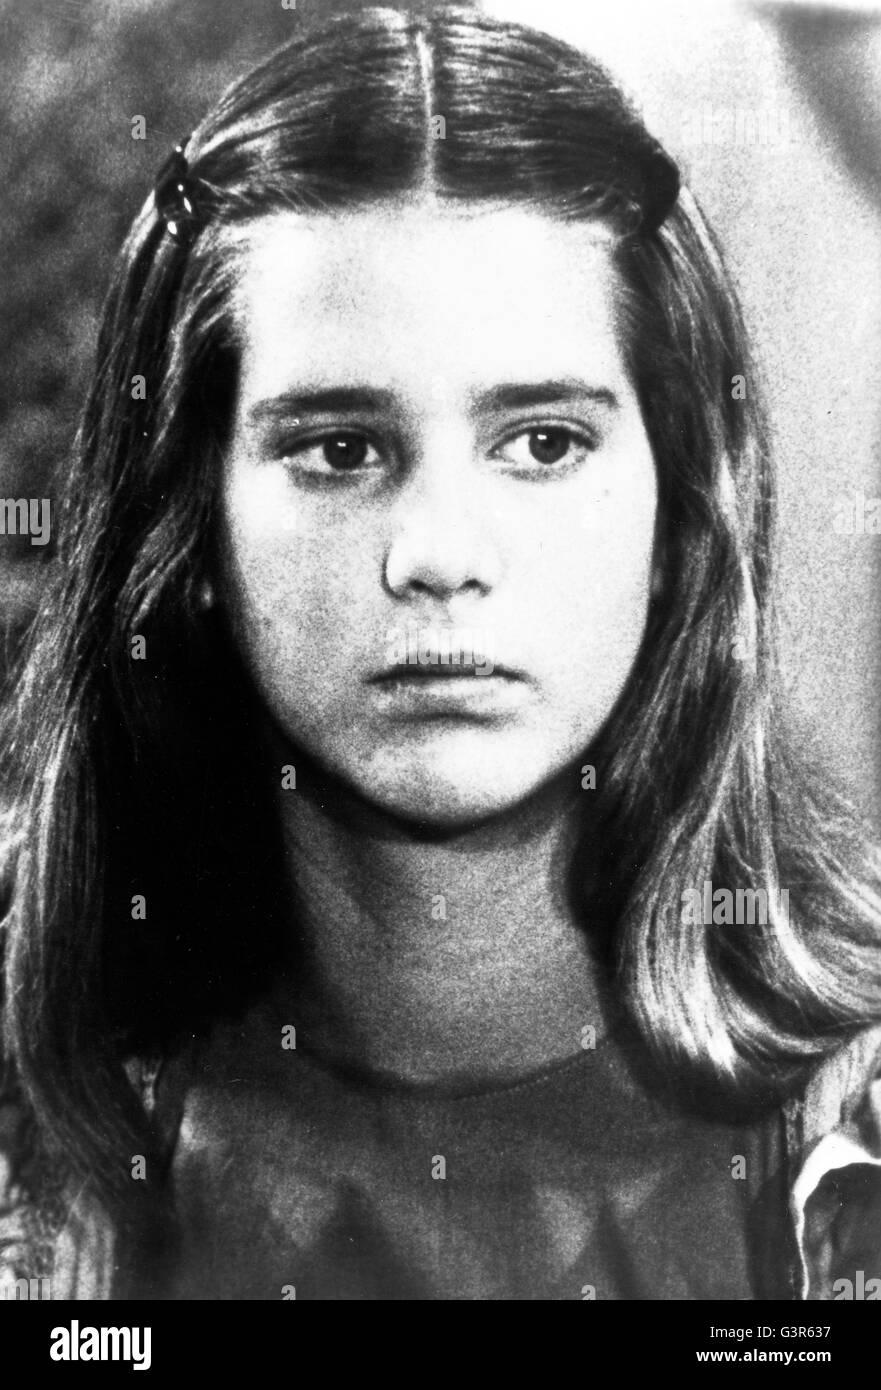 Klara Wester SWE,Natalie Joy Johnson Sex clip Madelaine Petsch,Jonalyn Viray (b. 1989)